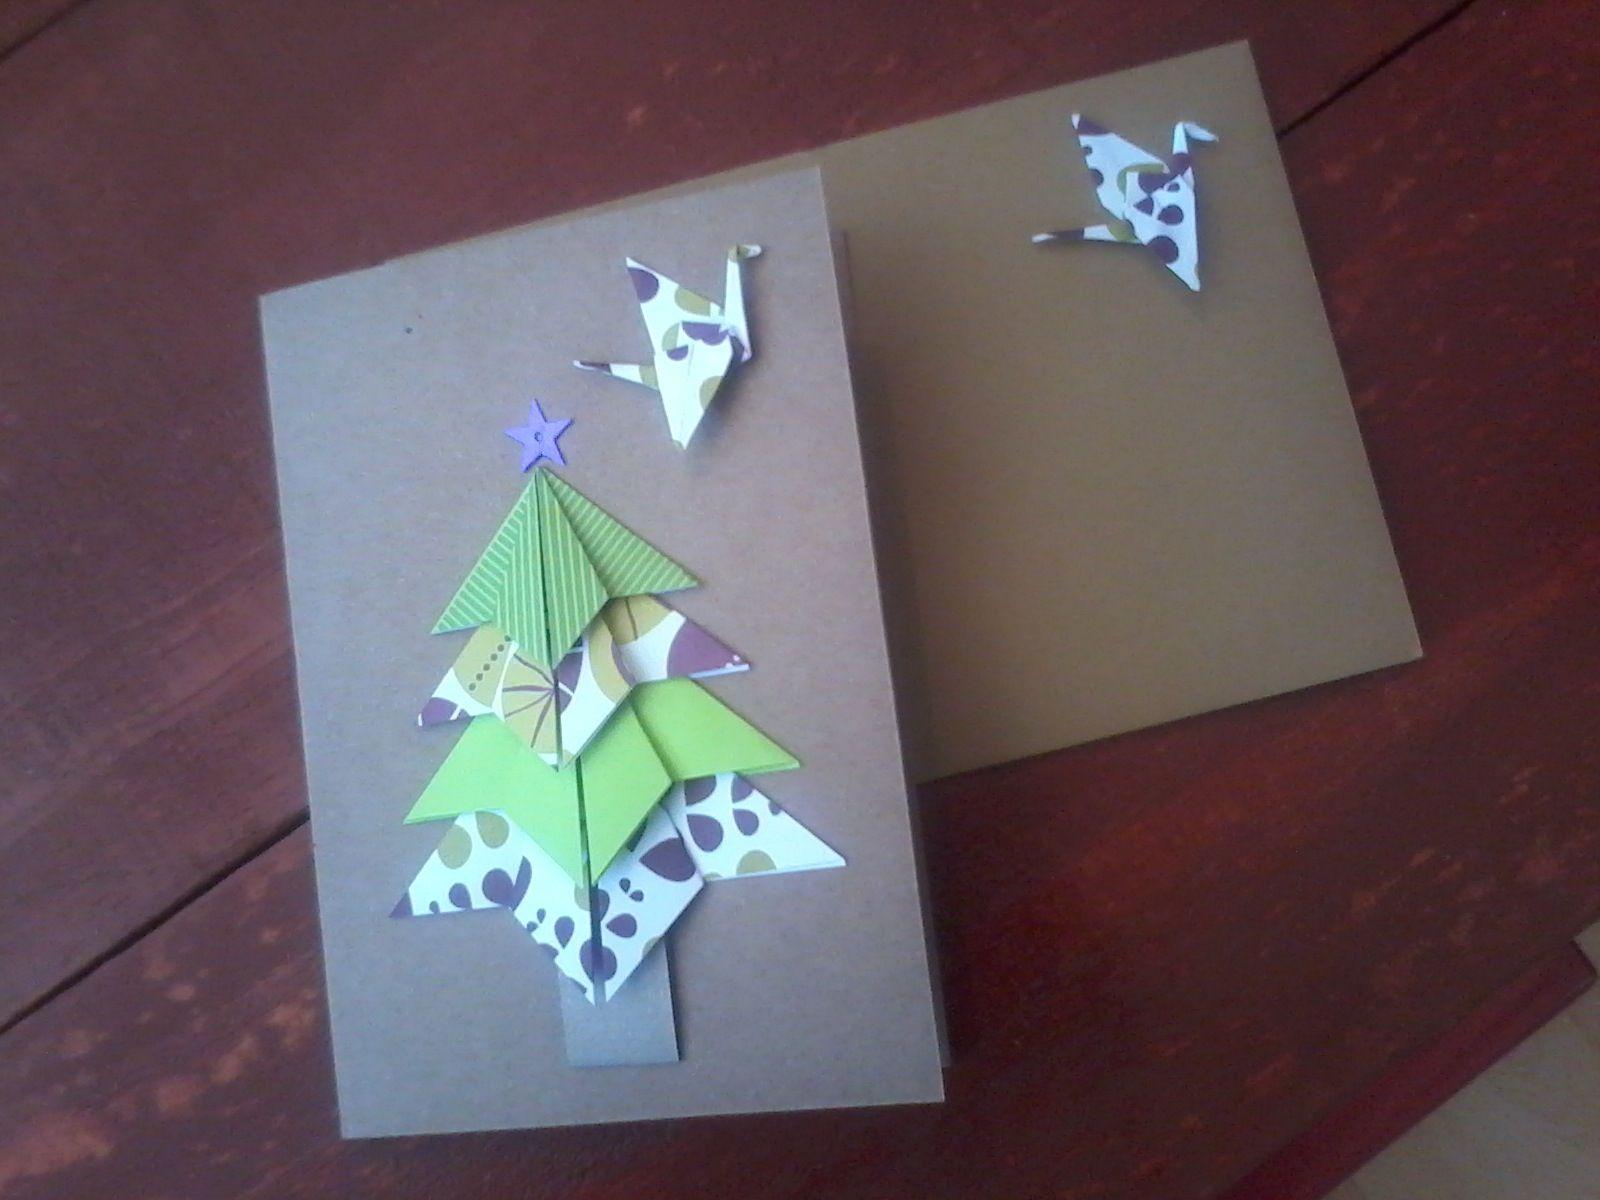 tarjetas de navidad ARTESANALES - Pesquisa Google